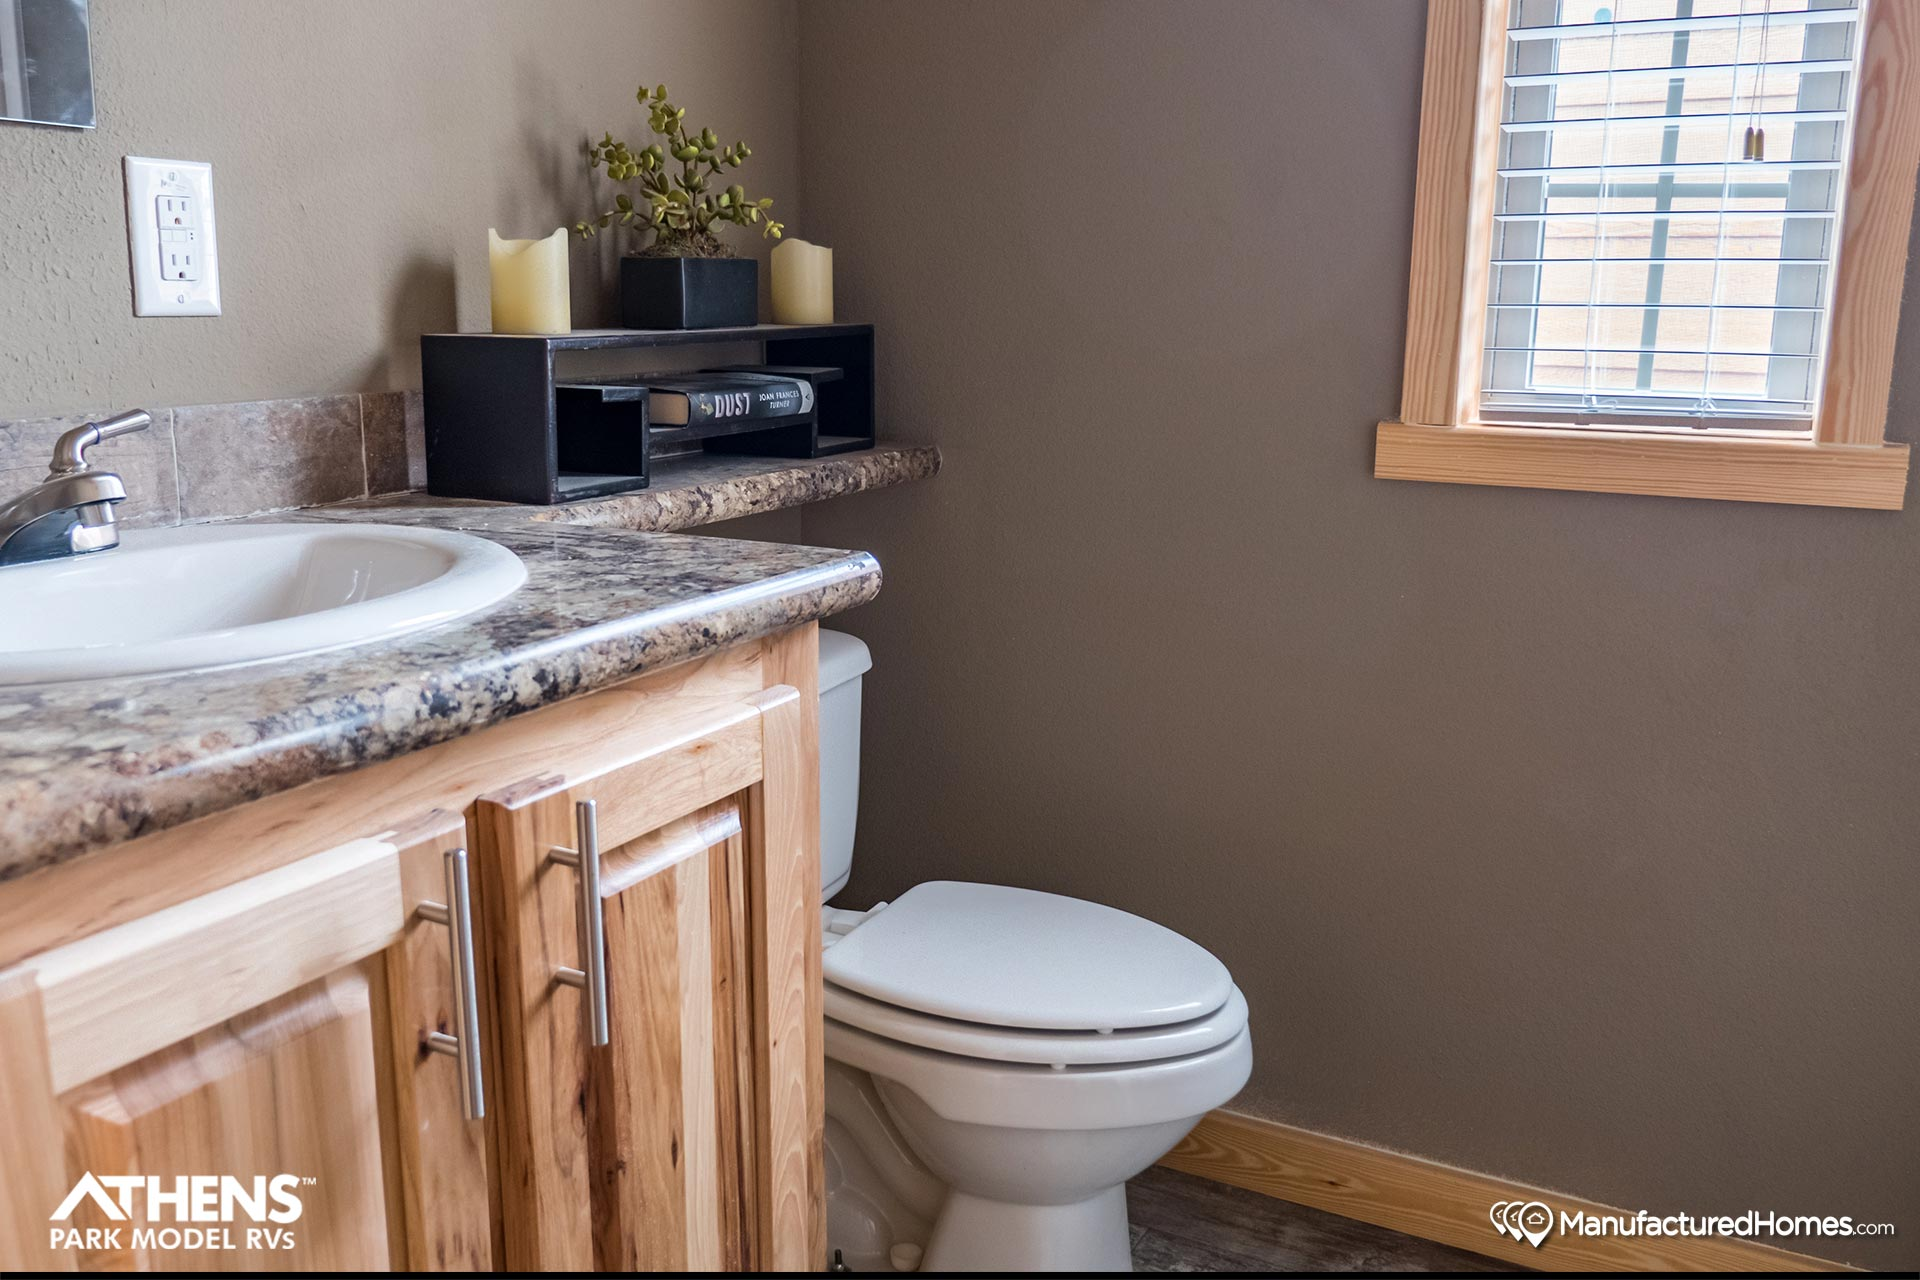 Park Model RV / APH 529 - Bathroom